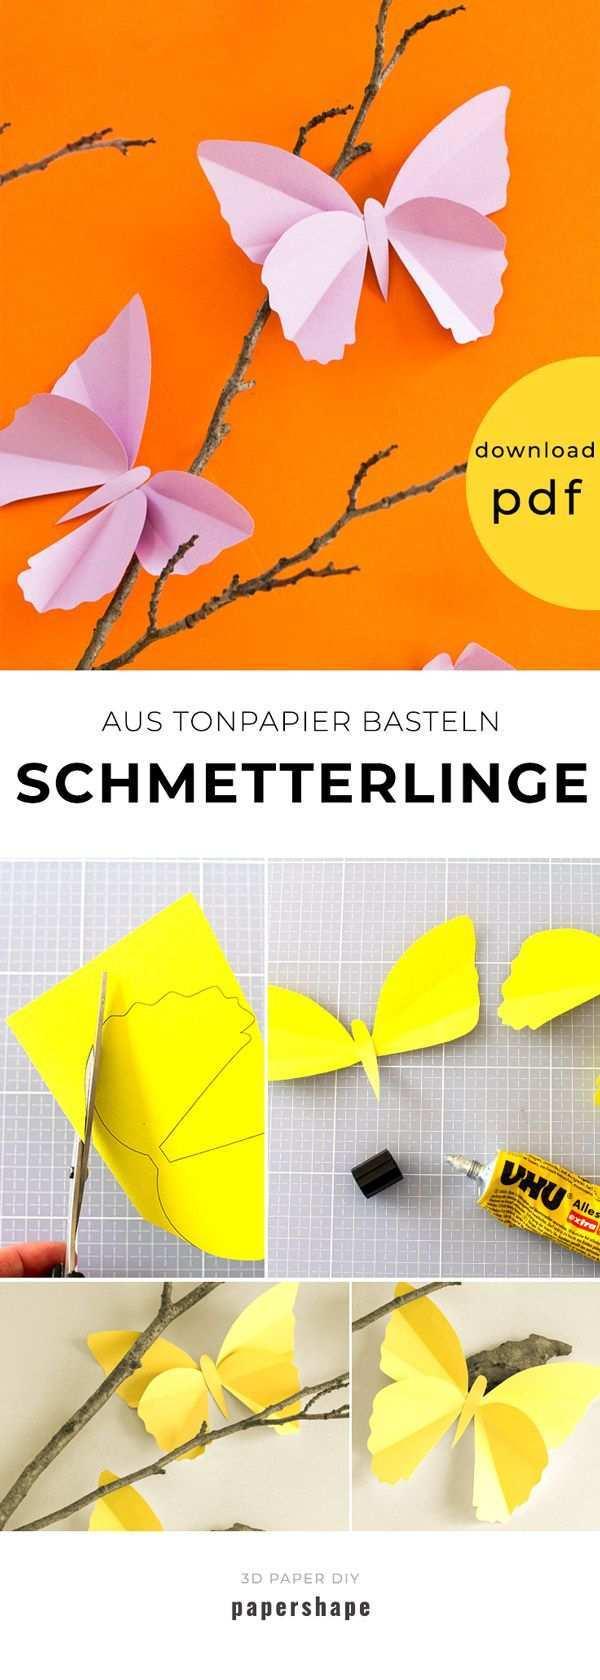 Einfache Schmetterlinge Aus Tonpapier Basteln Mit Vorlage Schmetterlinge Basteln Tulpen Basteln Basteln Mit Tonpapier